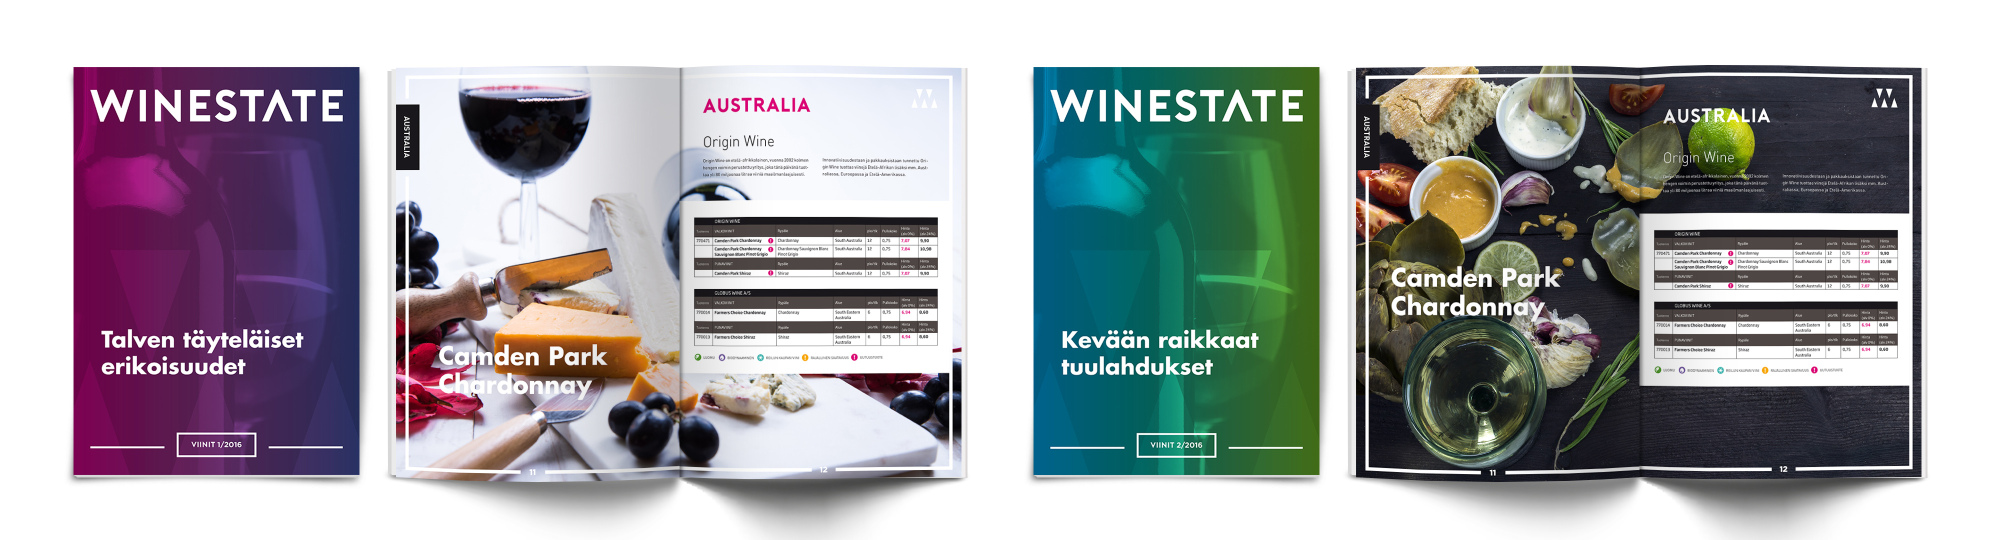 bm_winestate15